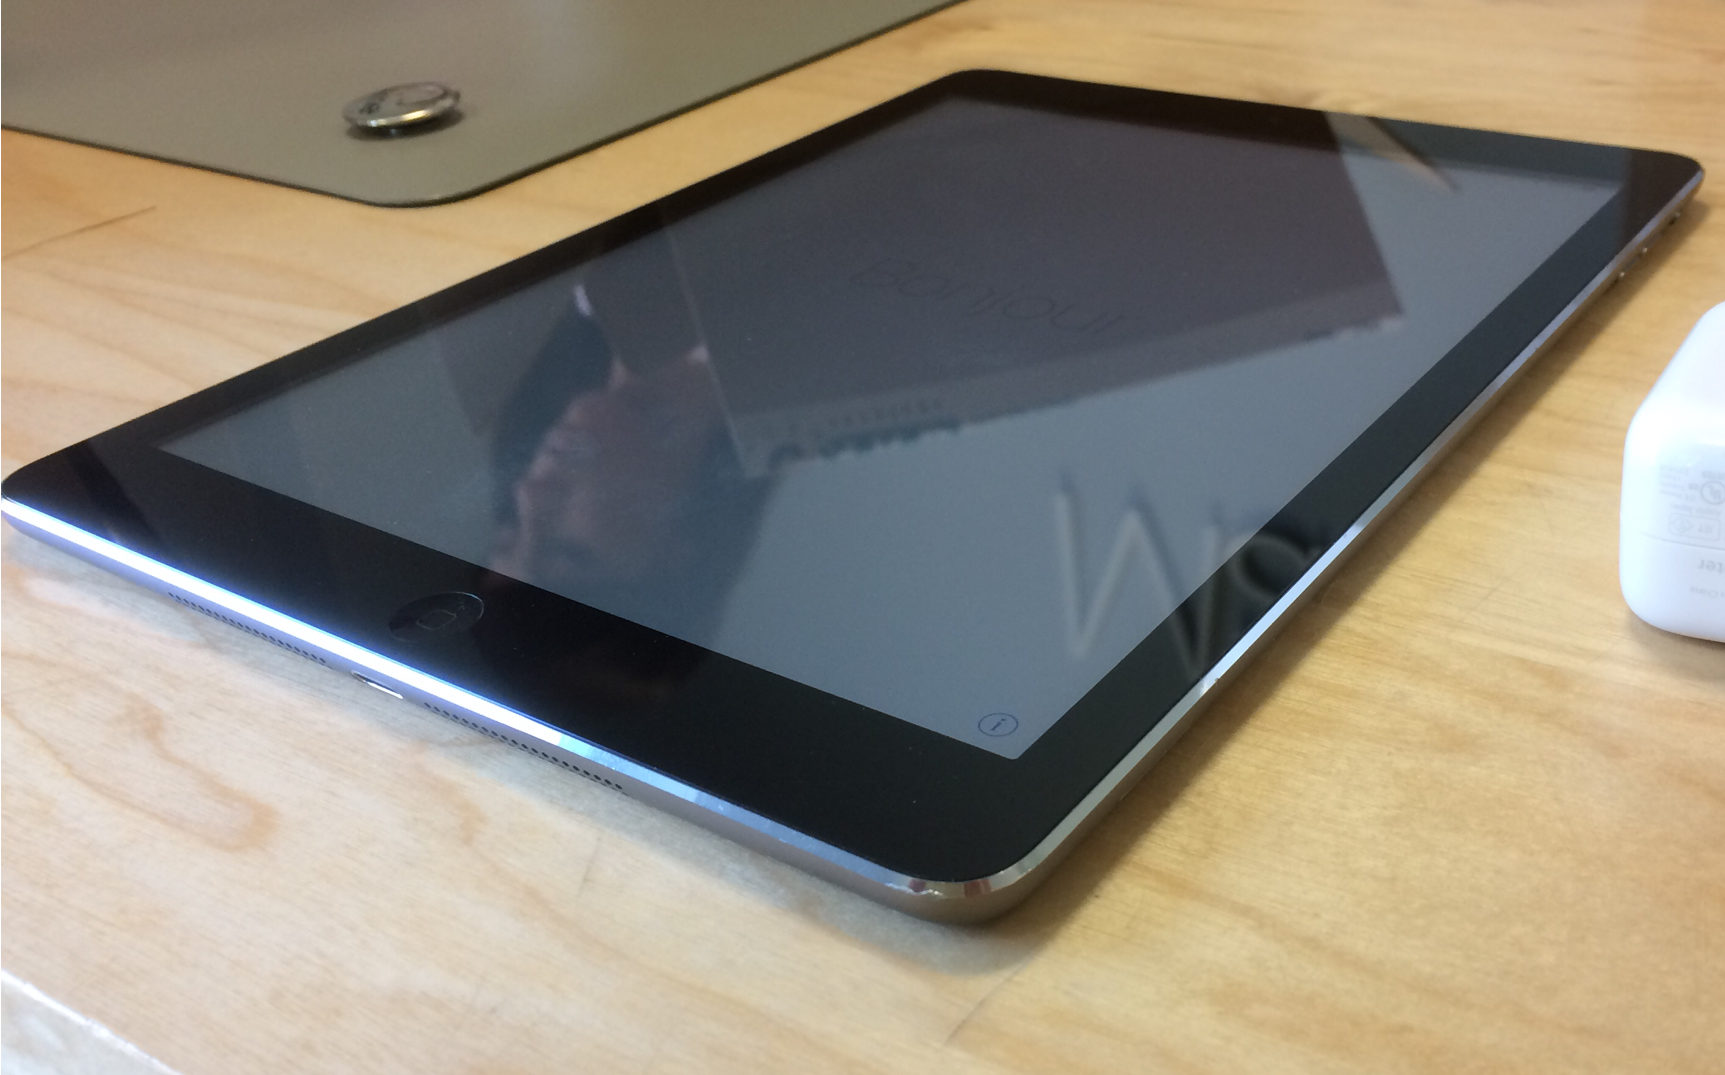 iPad Air (Wi-Fi + 4G), 64 GB, Space Gray, imagen 4